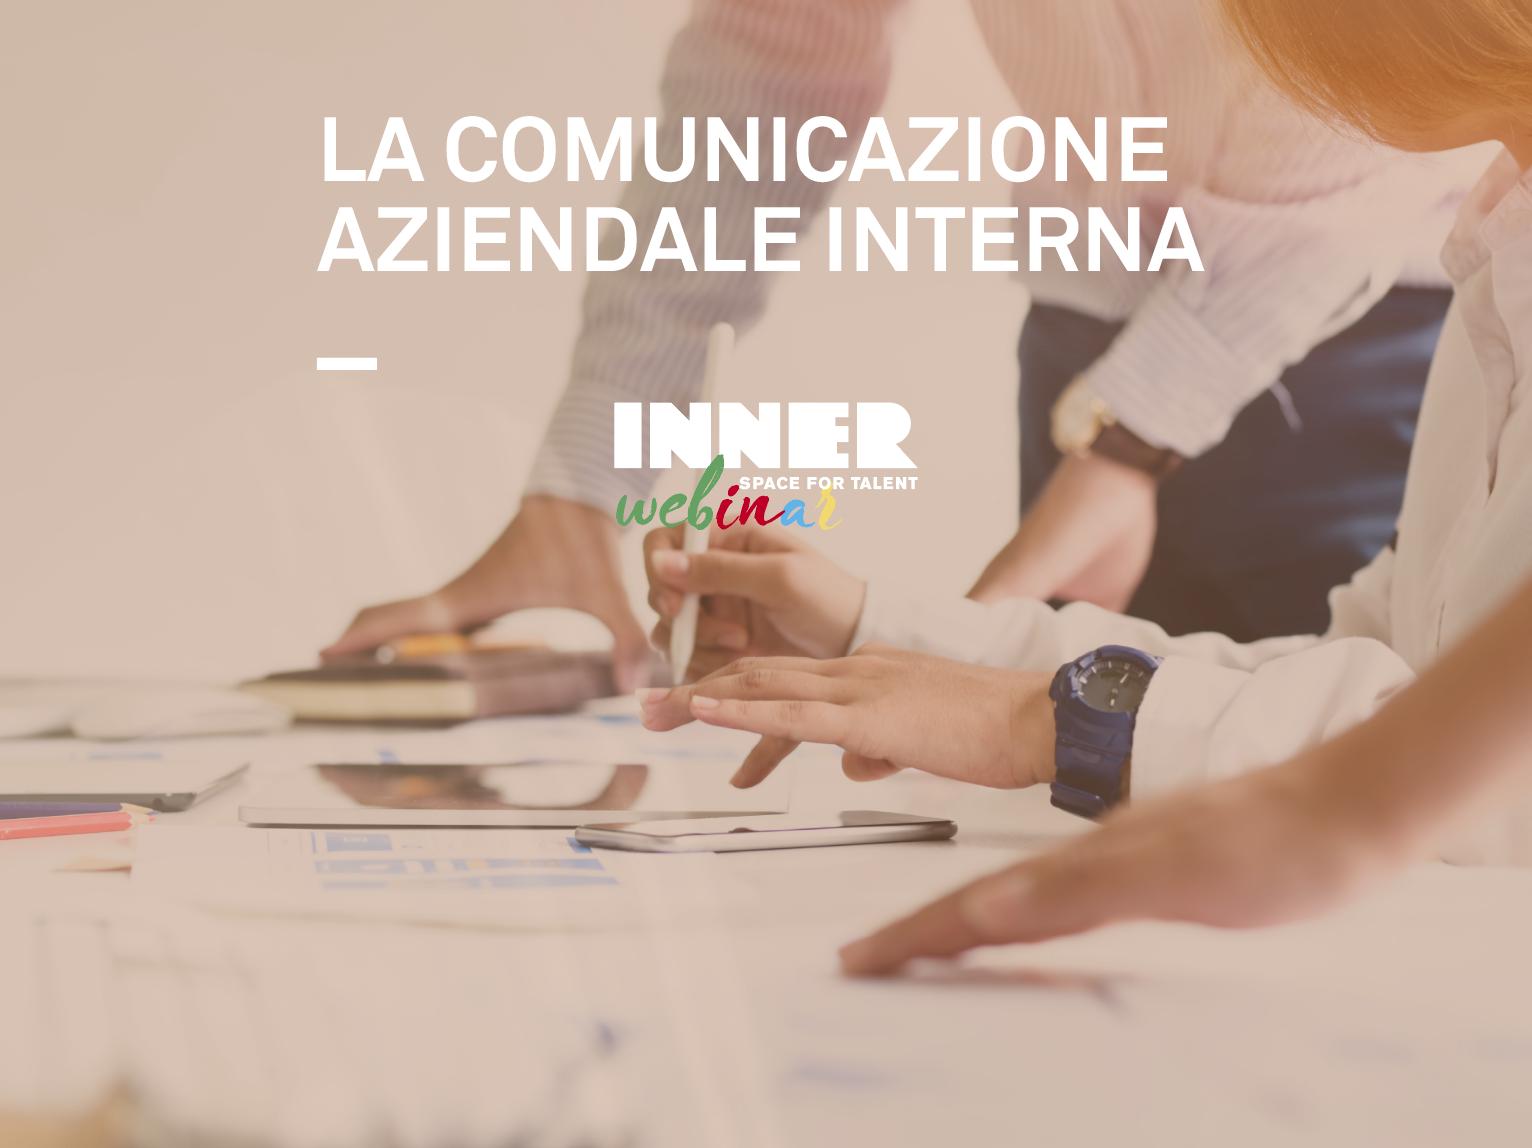 webinar comunicazione aziendale interna